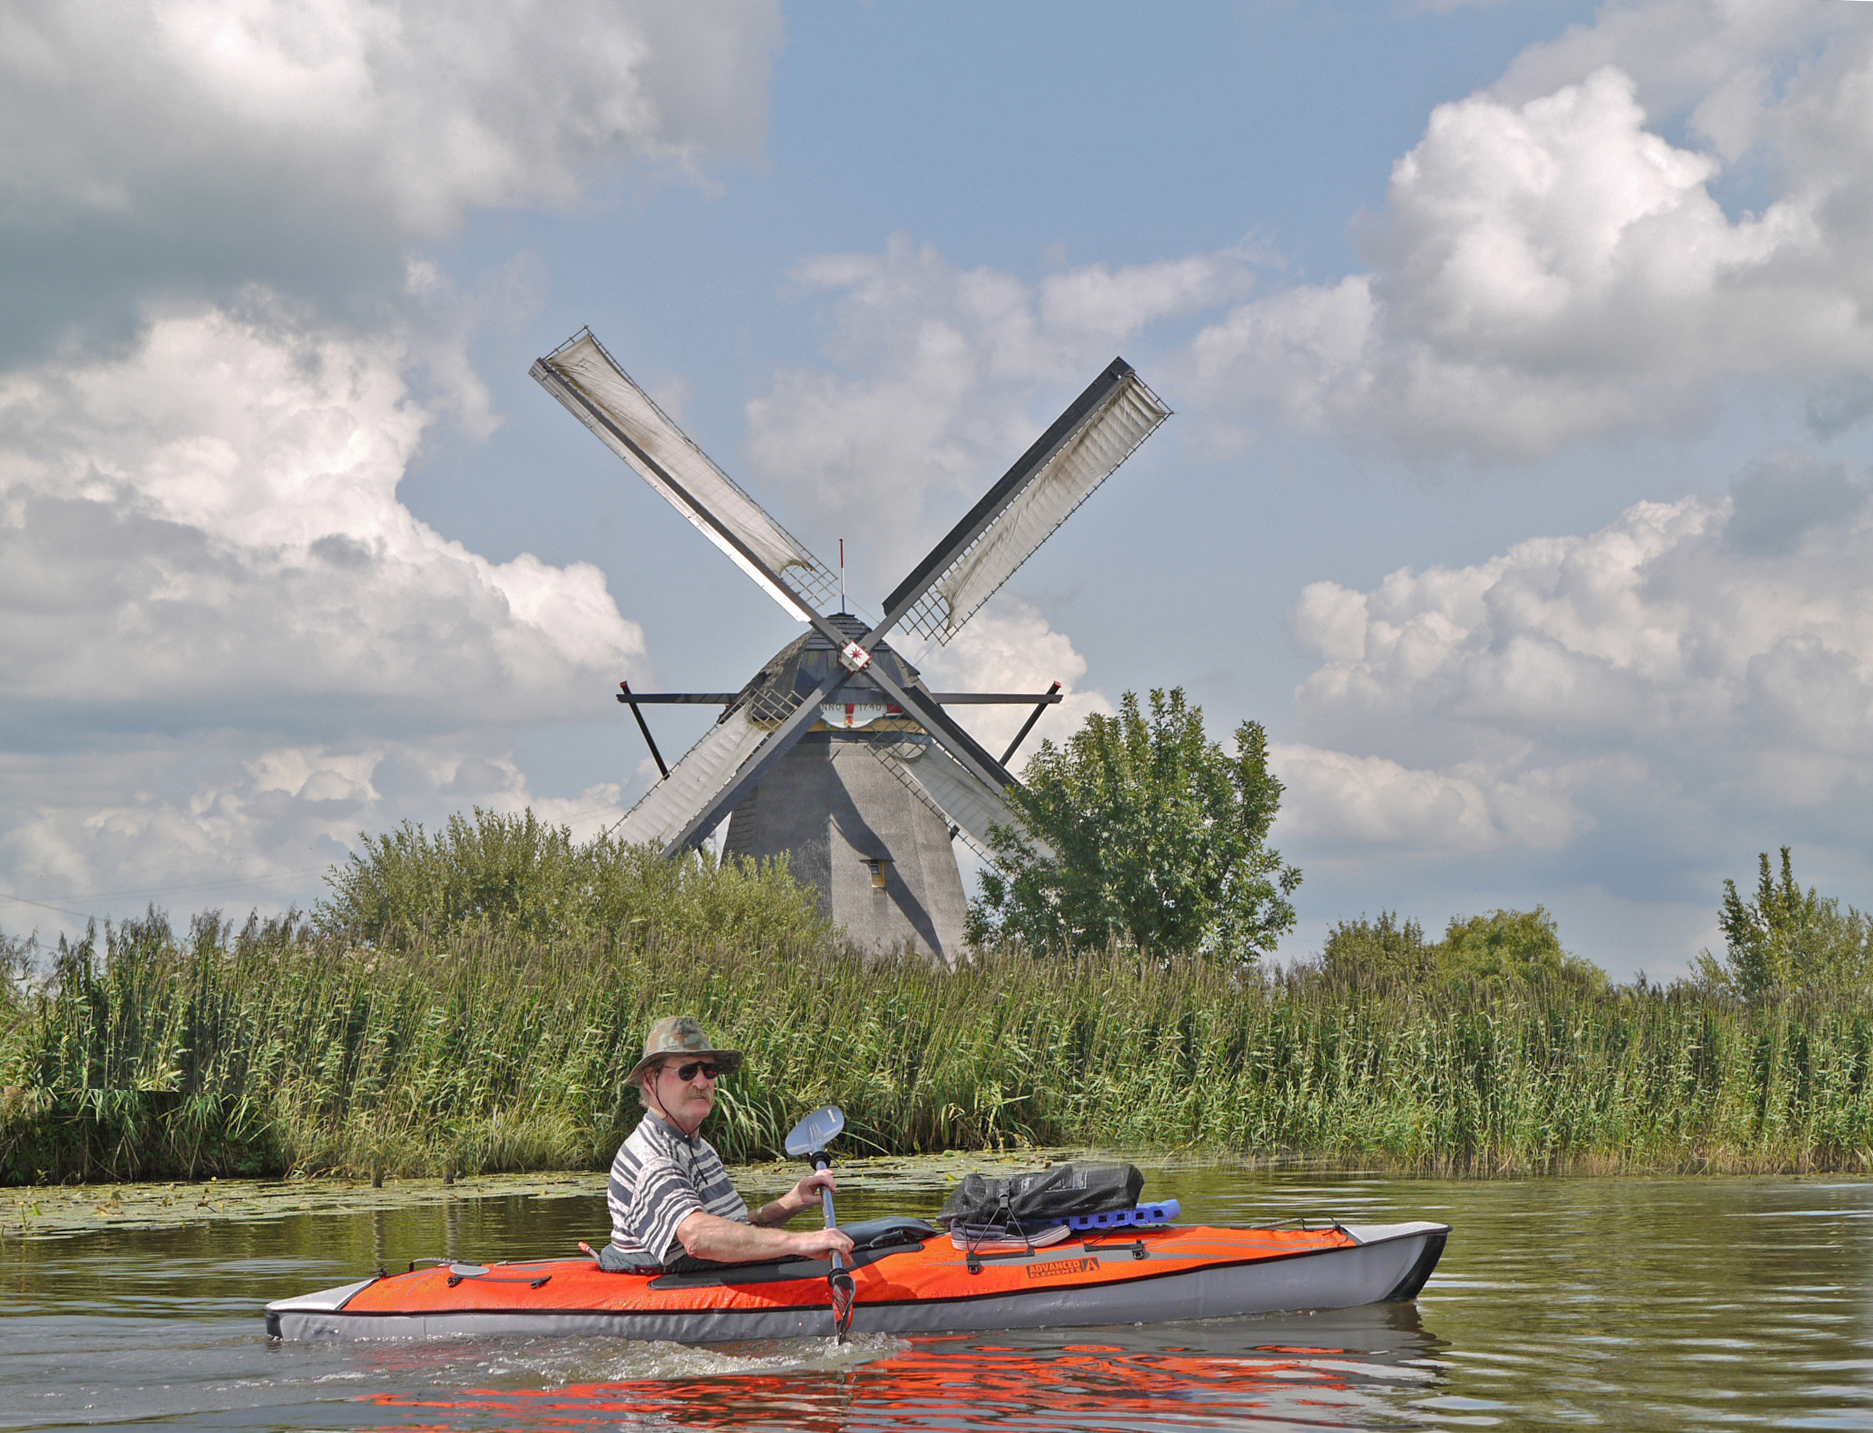 Kayaks: AdvancedFrame by Advanced Elements - Image 4493